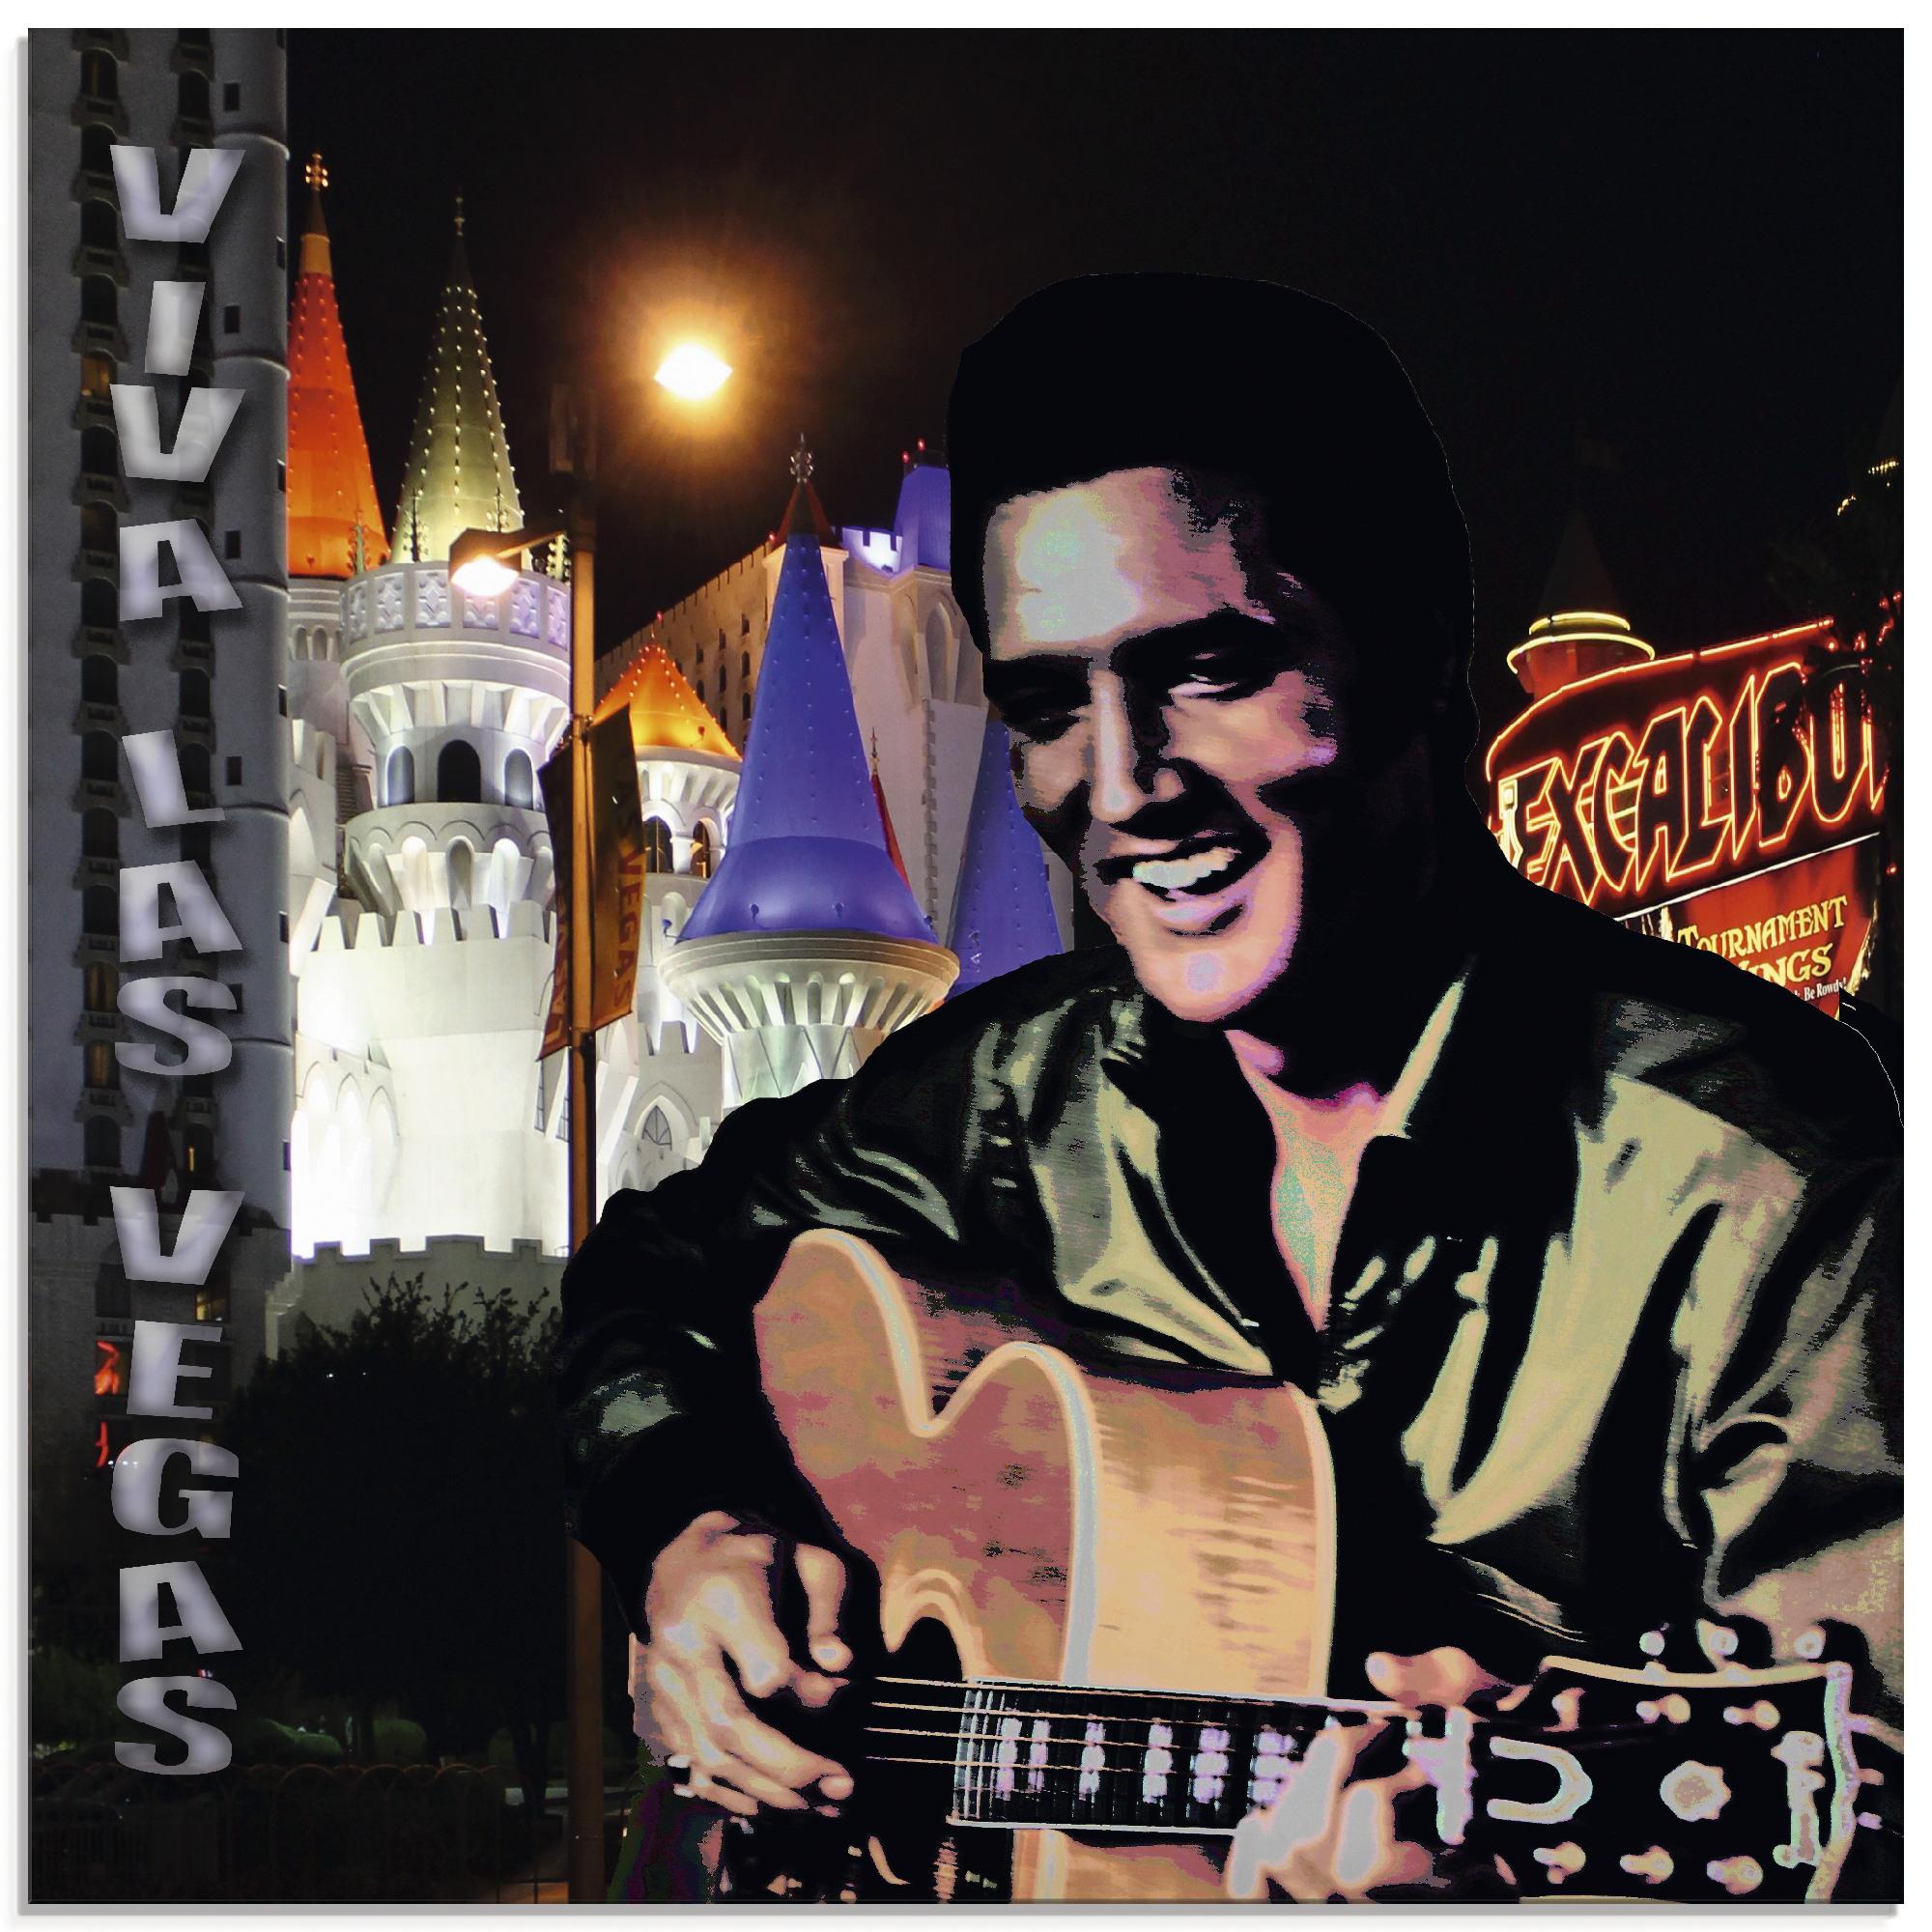 Artland Glasbild Elvis Presley, (1 St.) bunt Glasbilder Bilder Bilderrahmen Wohnaccessoires